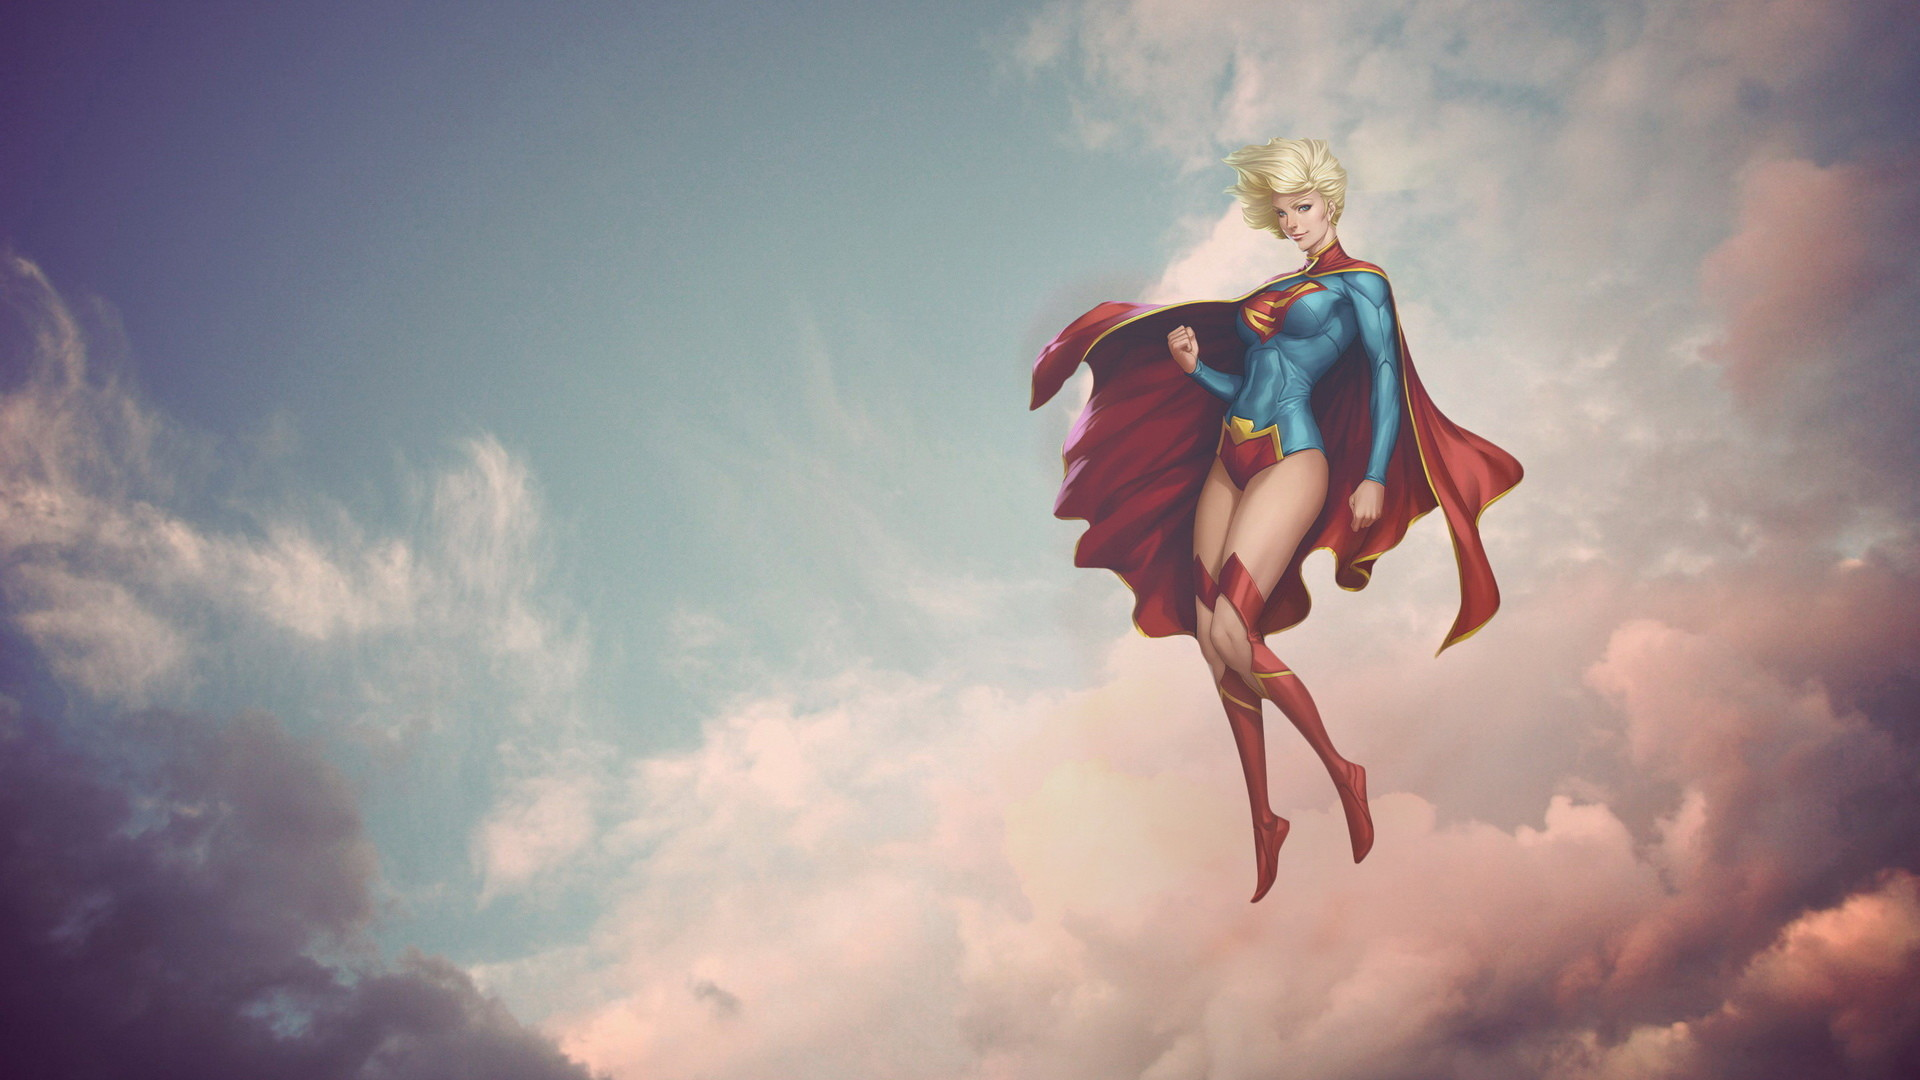 Supergirl Wallpaper p Supergirl Wallpaper Wallpapers)